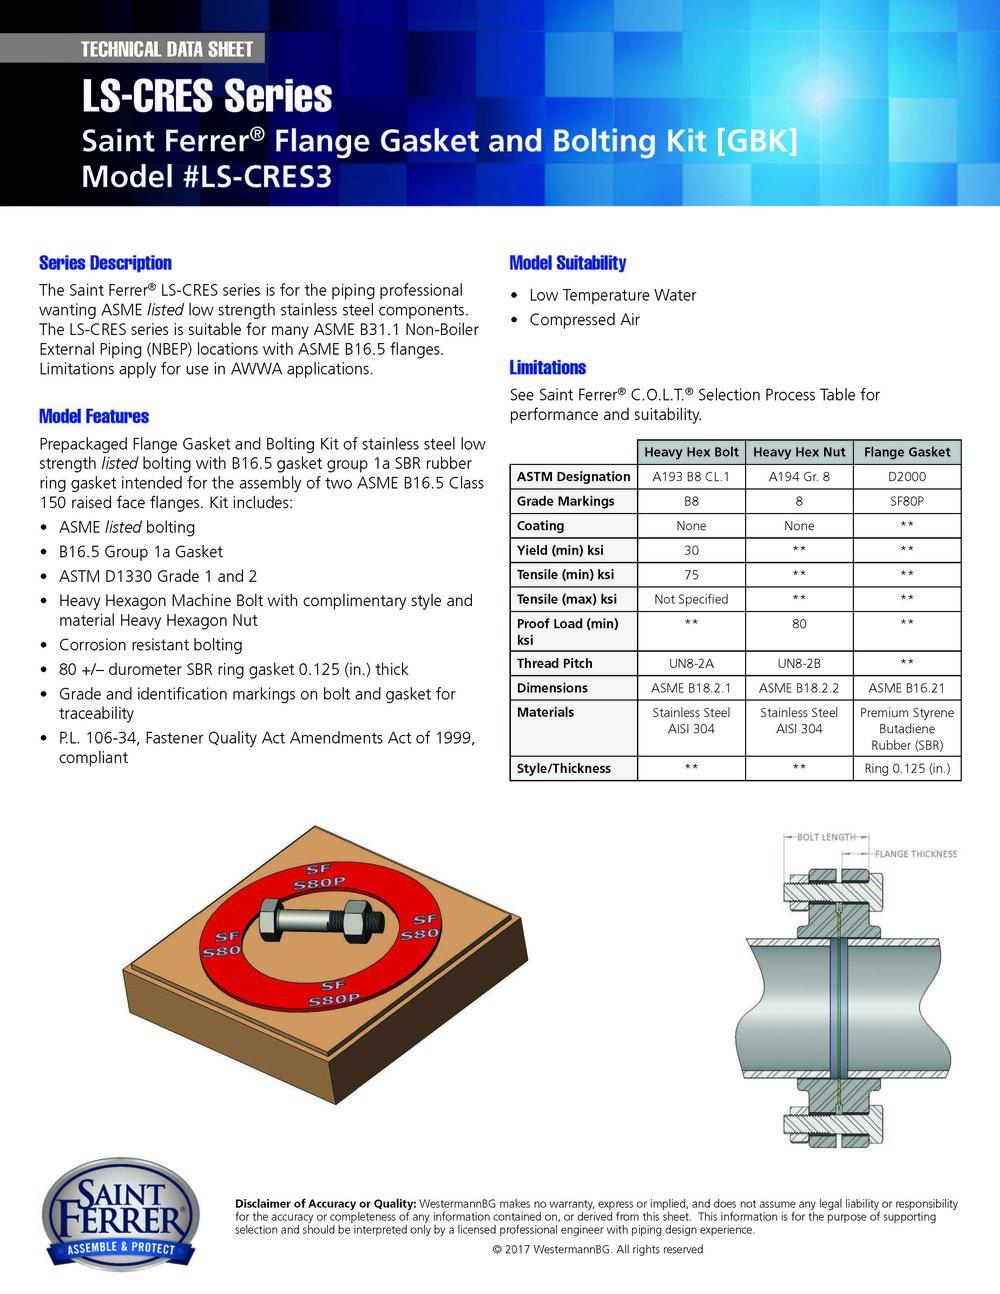 SF_Data_Sheet_LS-CRES_Series_LS-CRES3.jpg